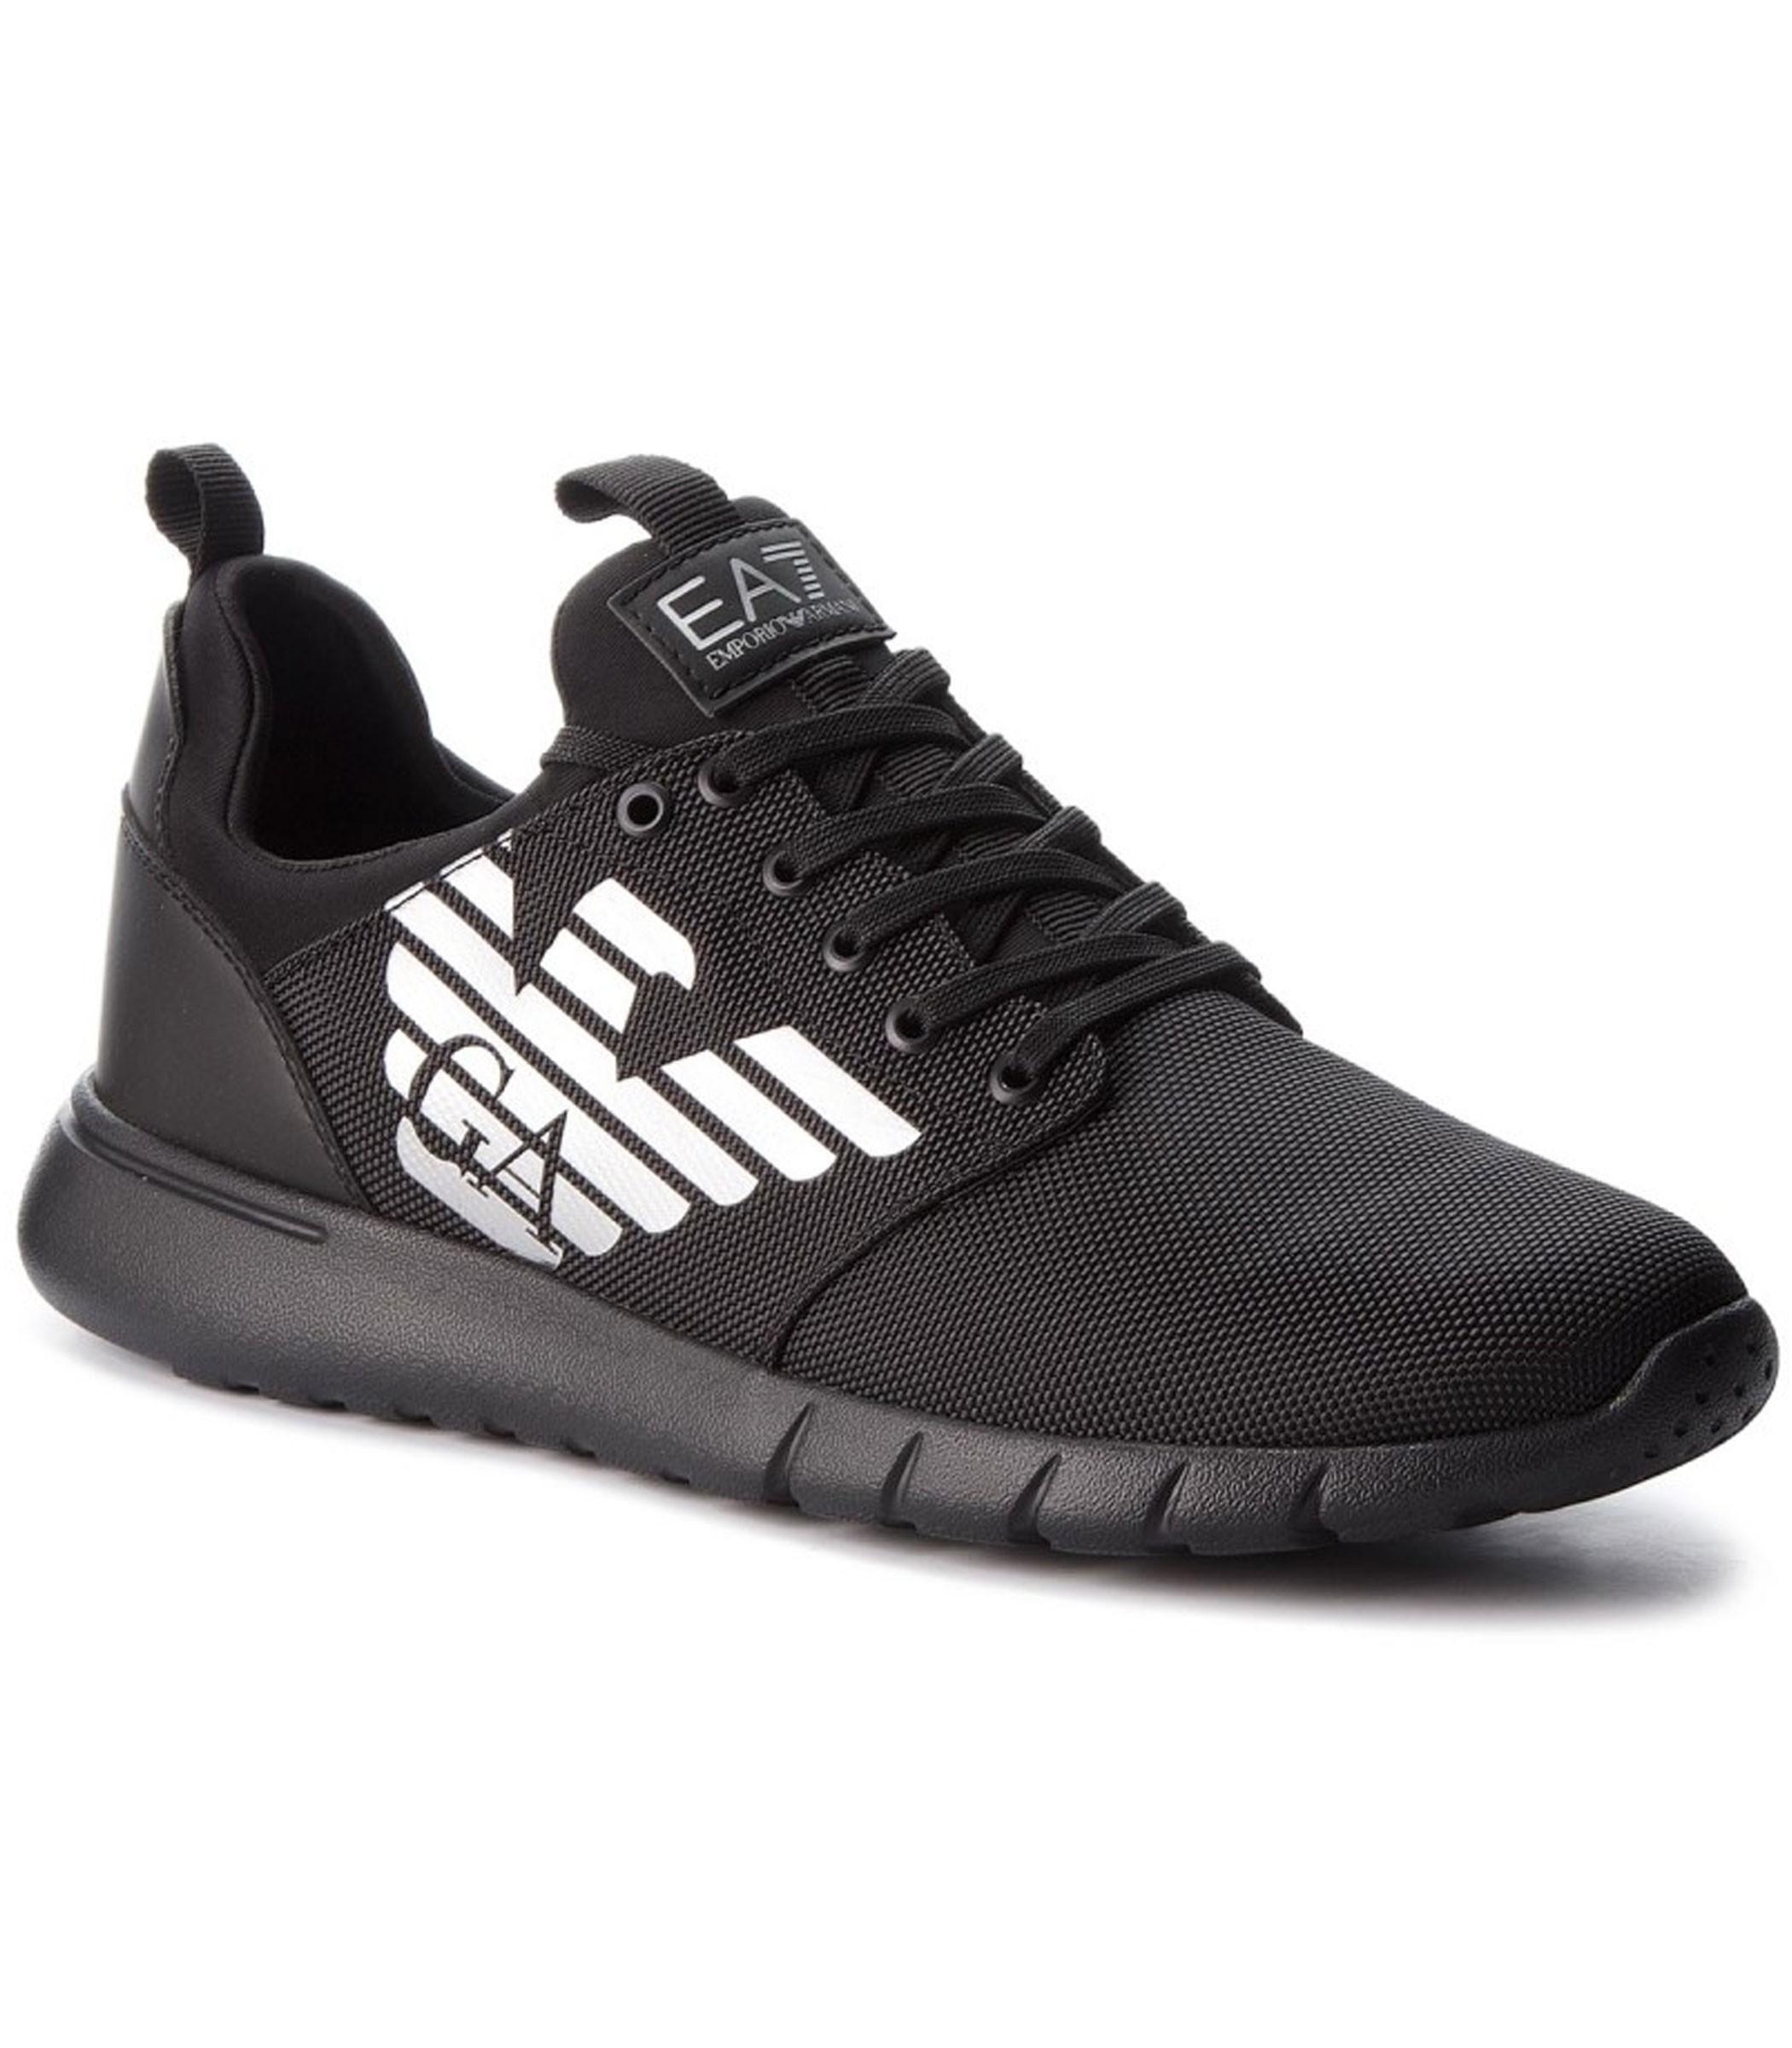 Scarpe Sneaker EA7 Emporio Armani Ecopelle Black X8X008 XK008 00002 Uomo ... 45b5830f89c